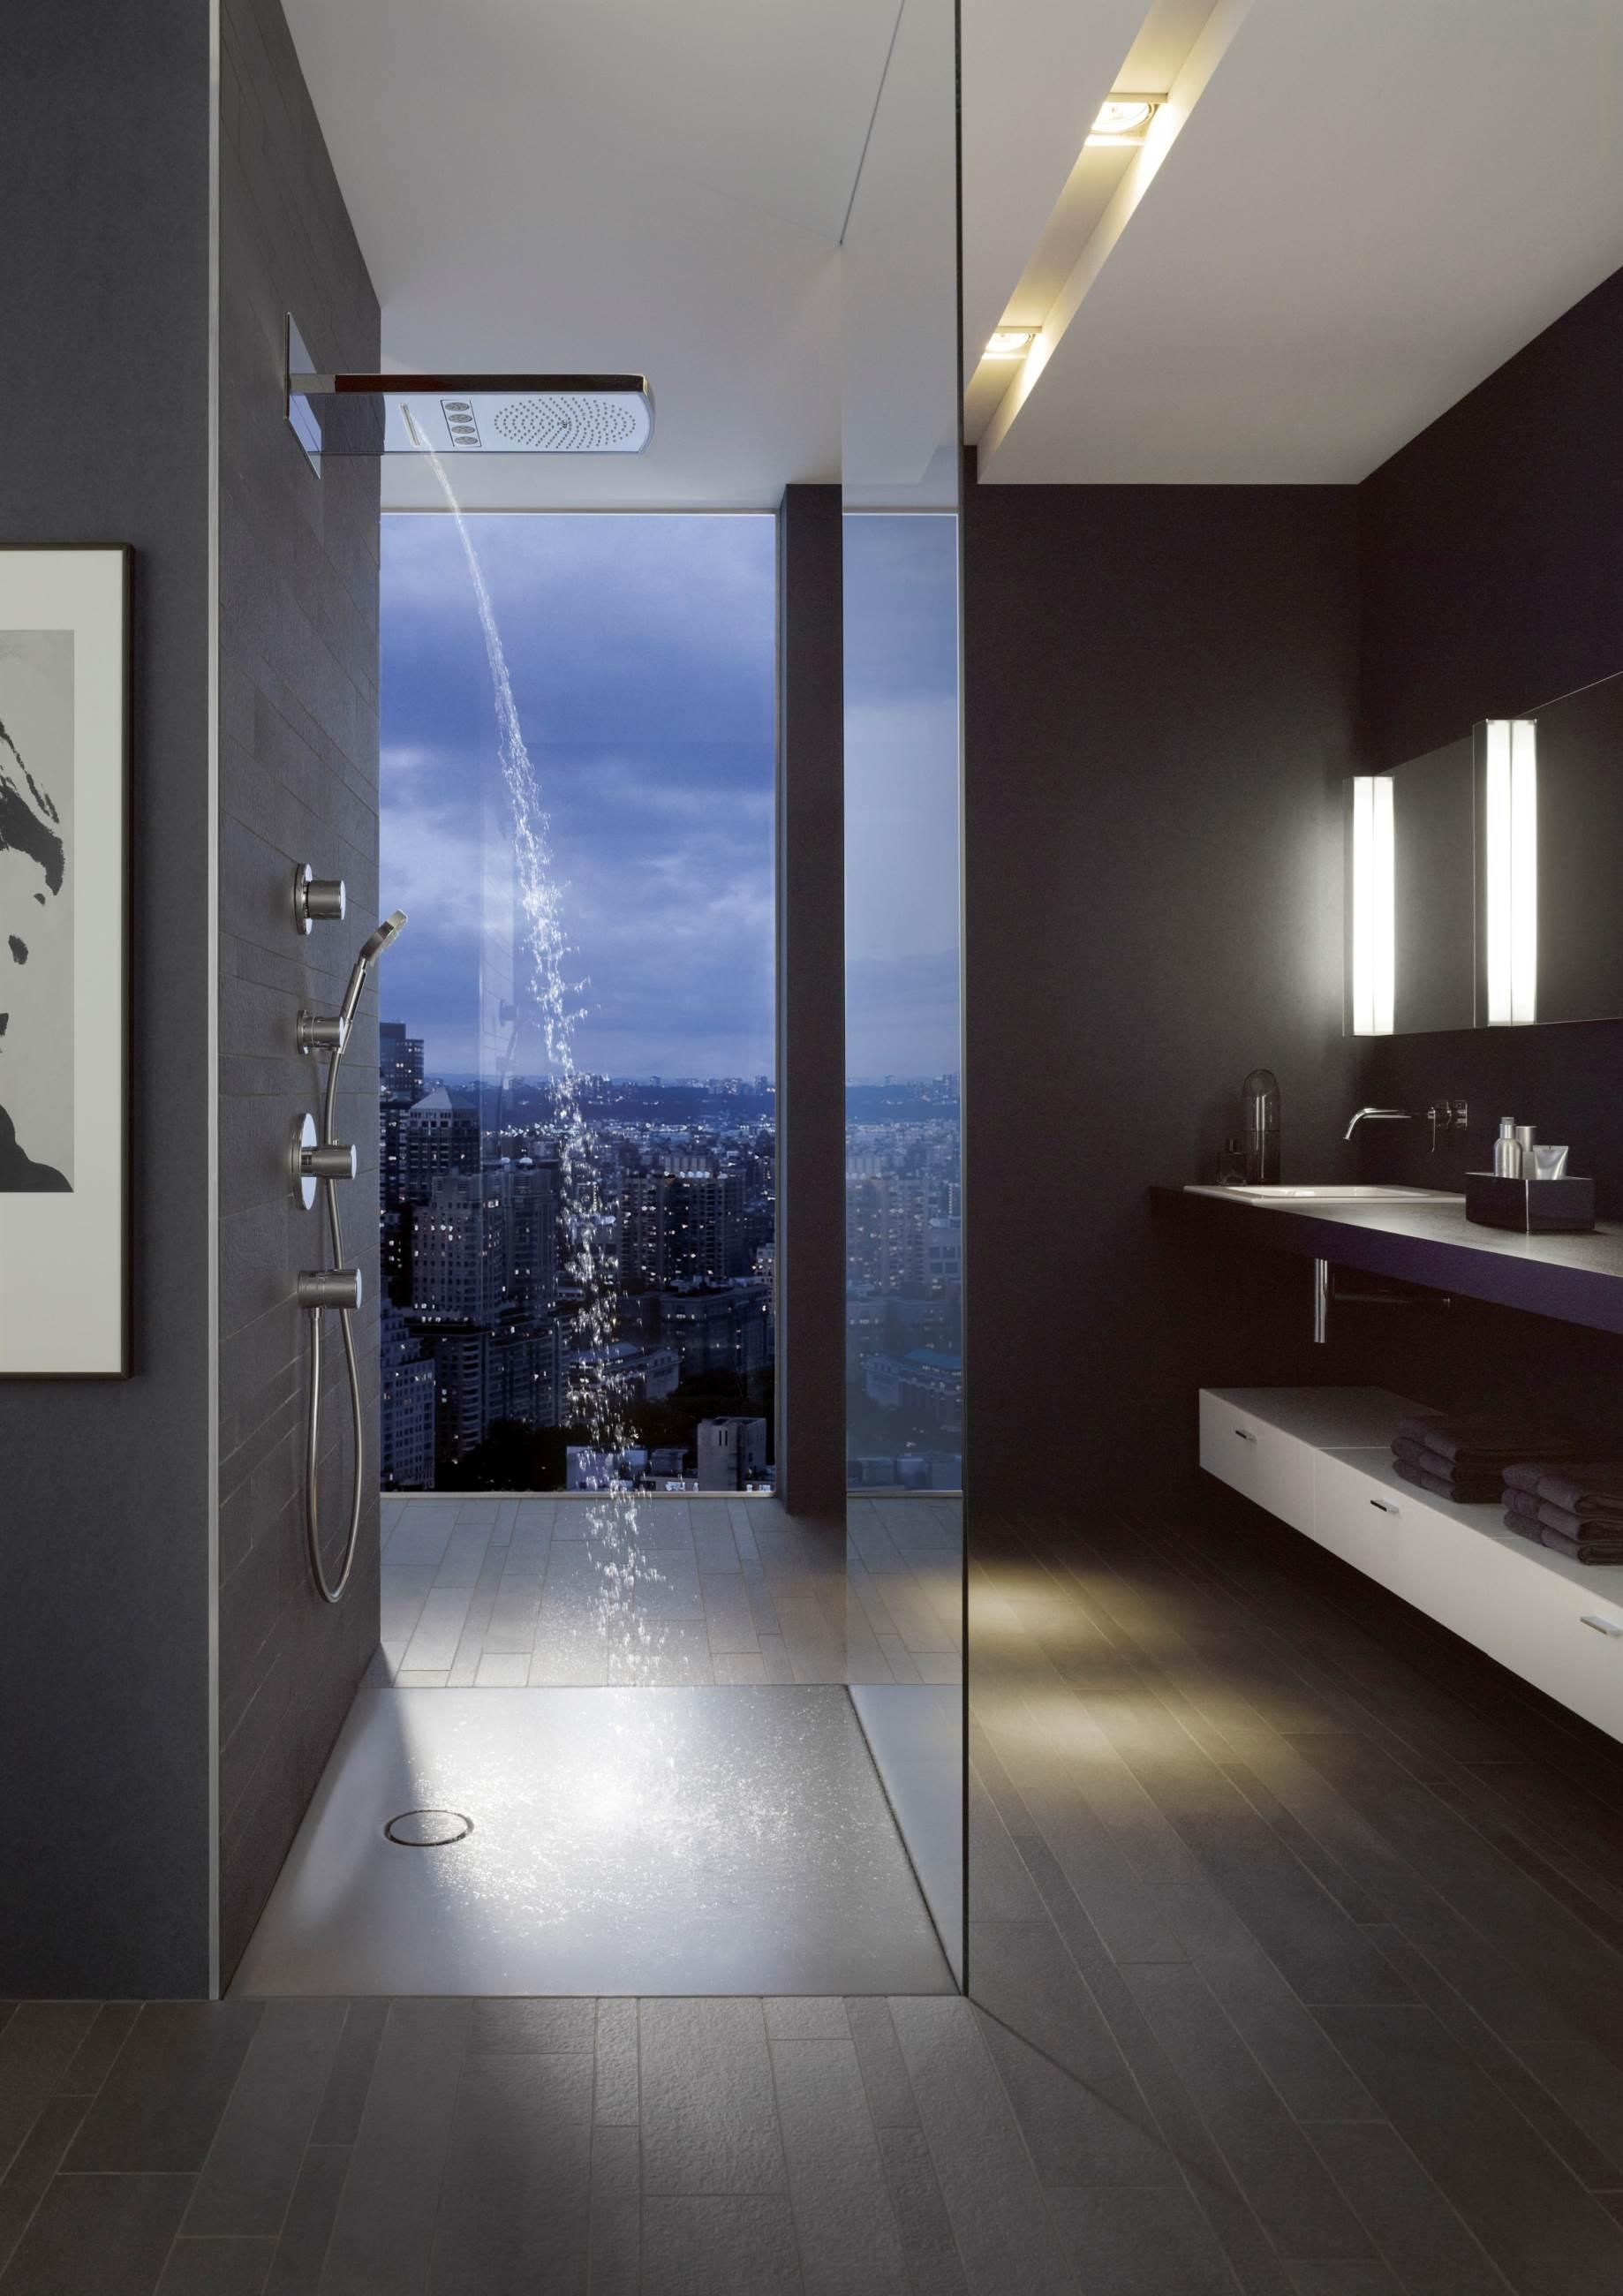 Badezimmer ideen whirlpool bette floor manufacturers  beautiful bathrooms  banheiros